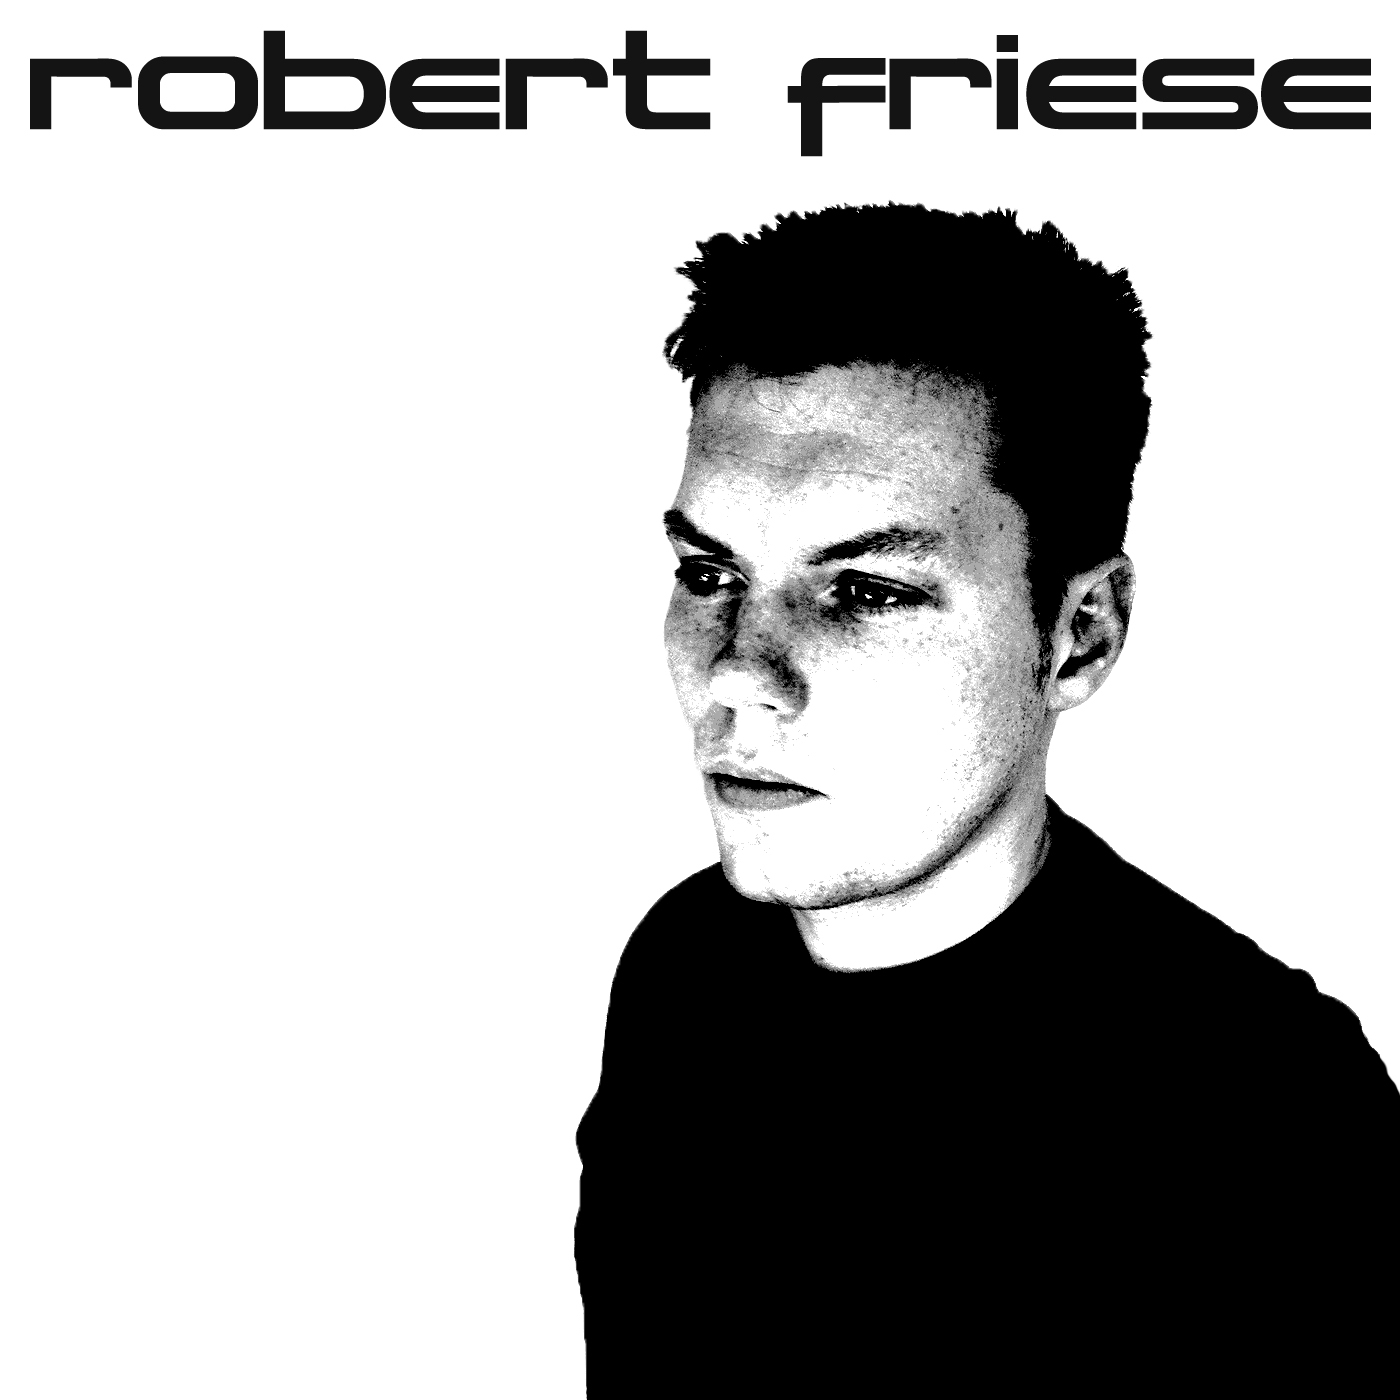 Robert Friese - Everybody On Ecstasy